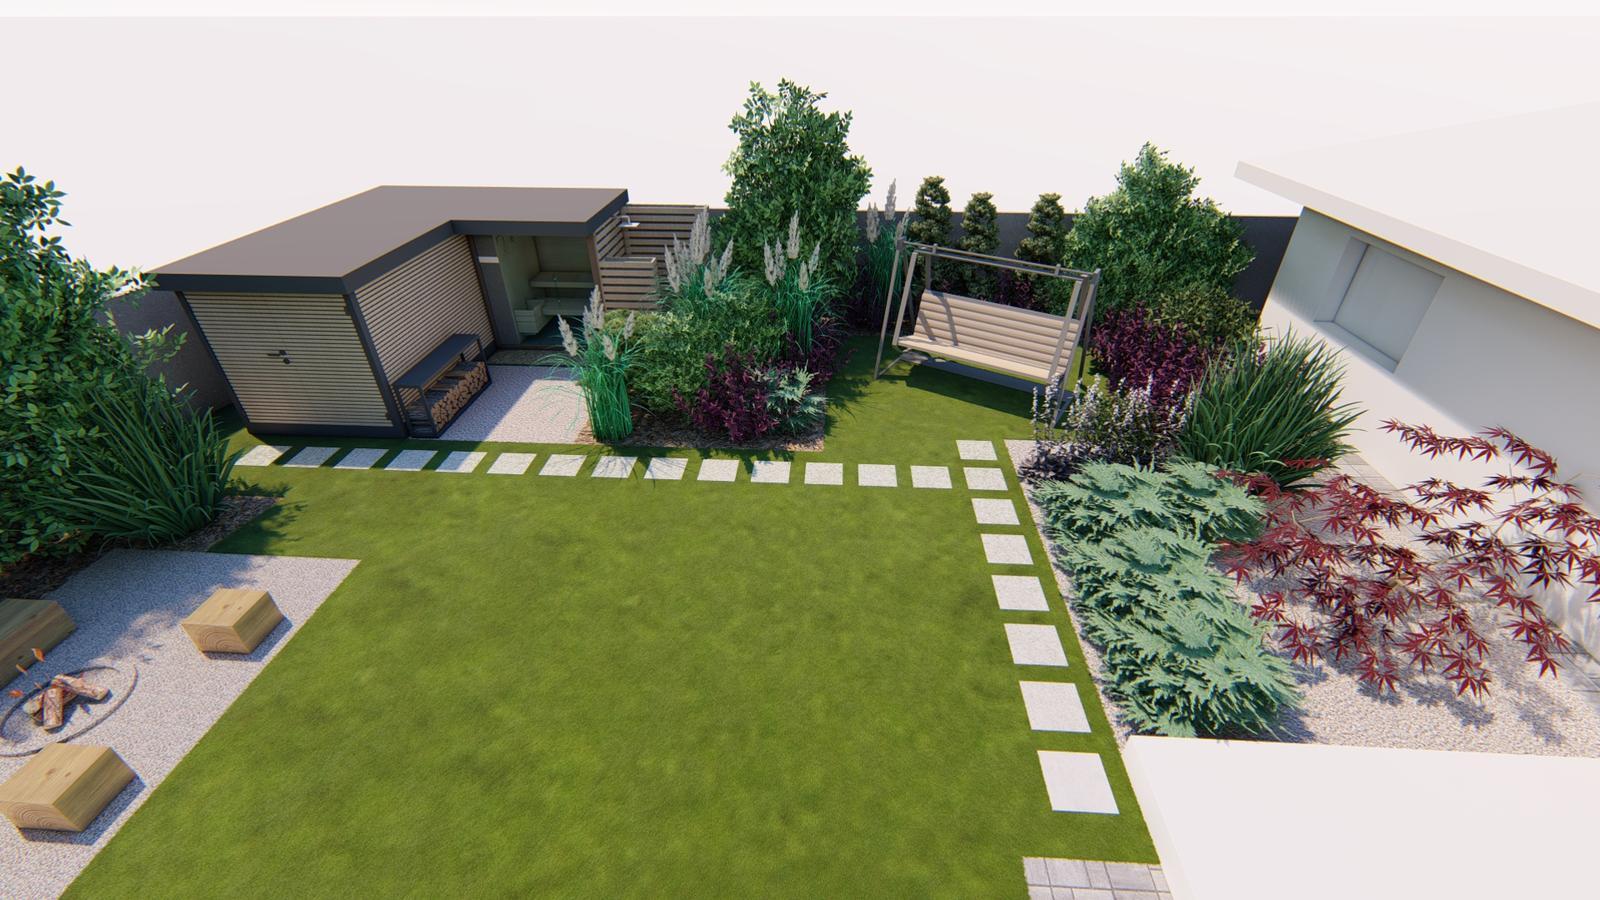 Návrh záhrady rodinného domu - Obrázok č. 26